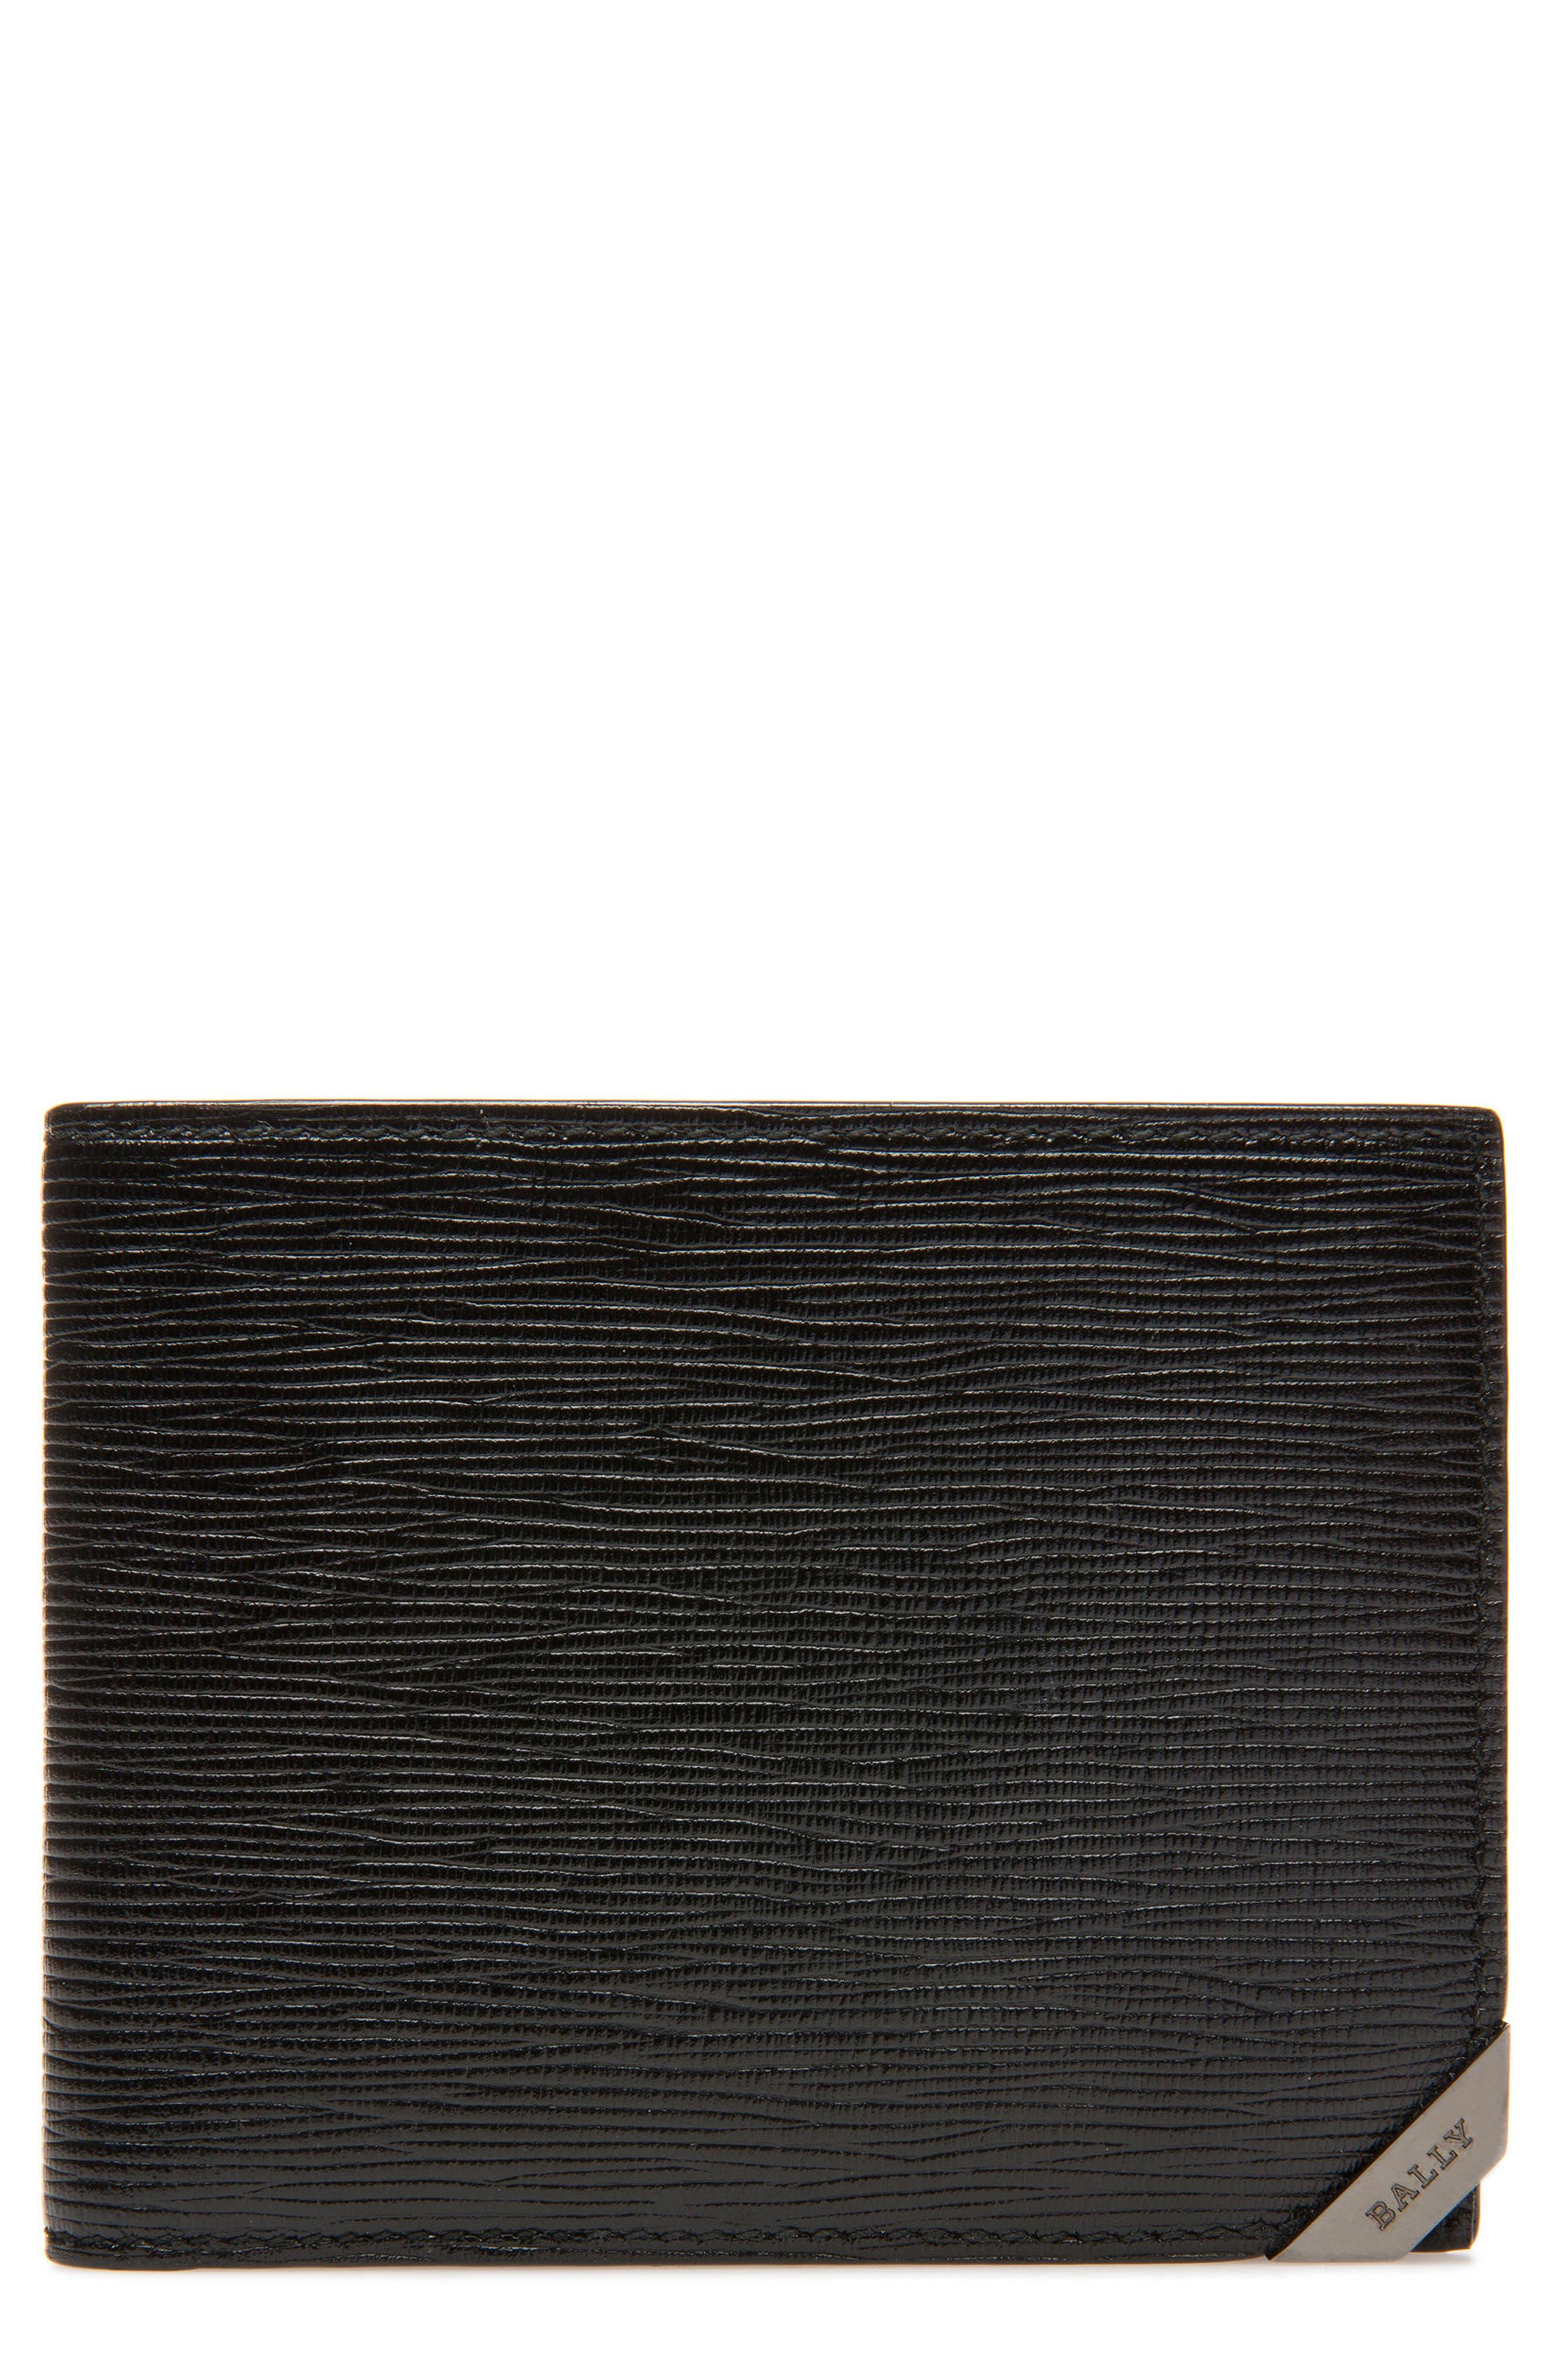 Bally Bevye Leather Wallet